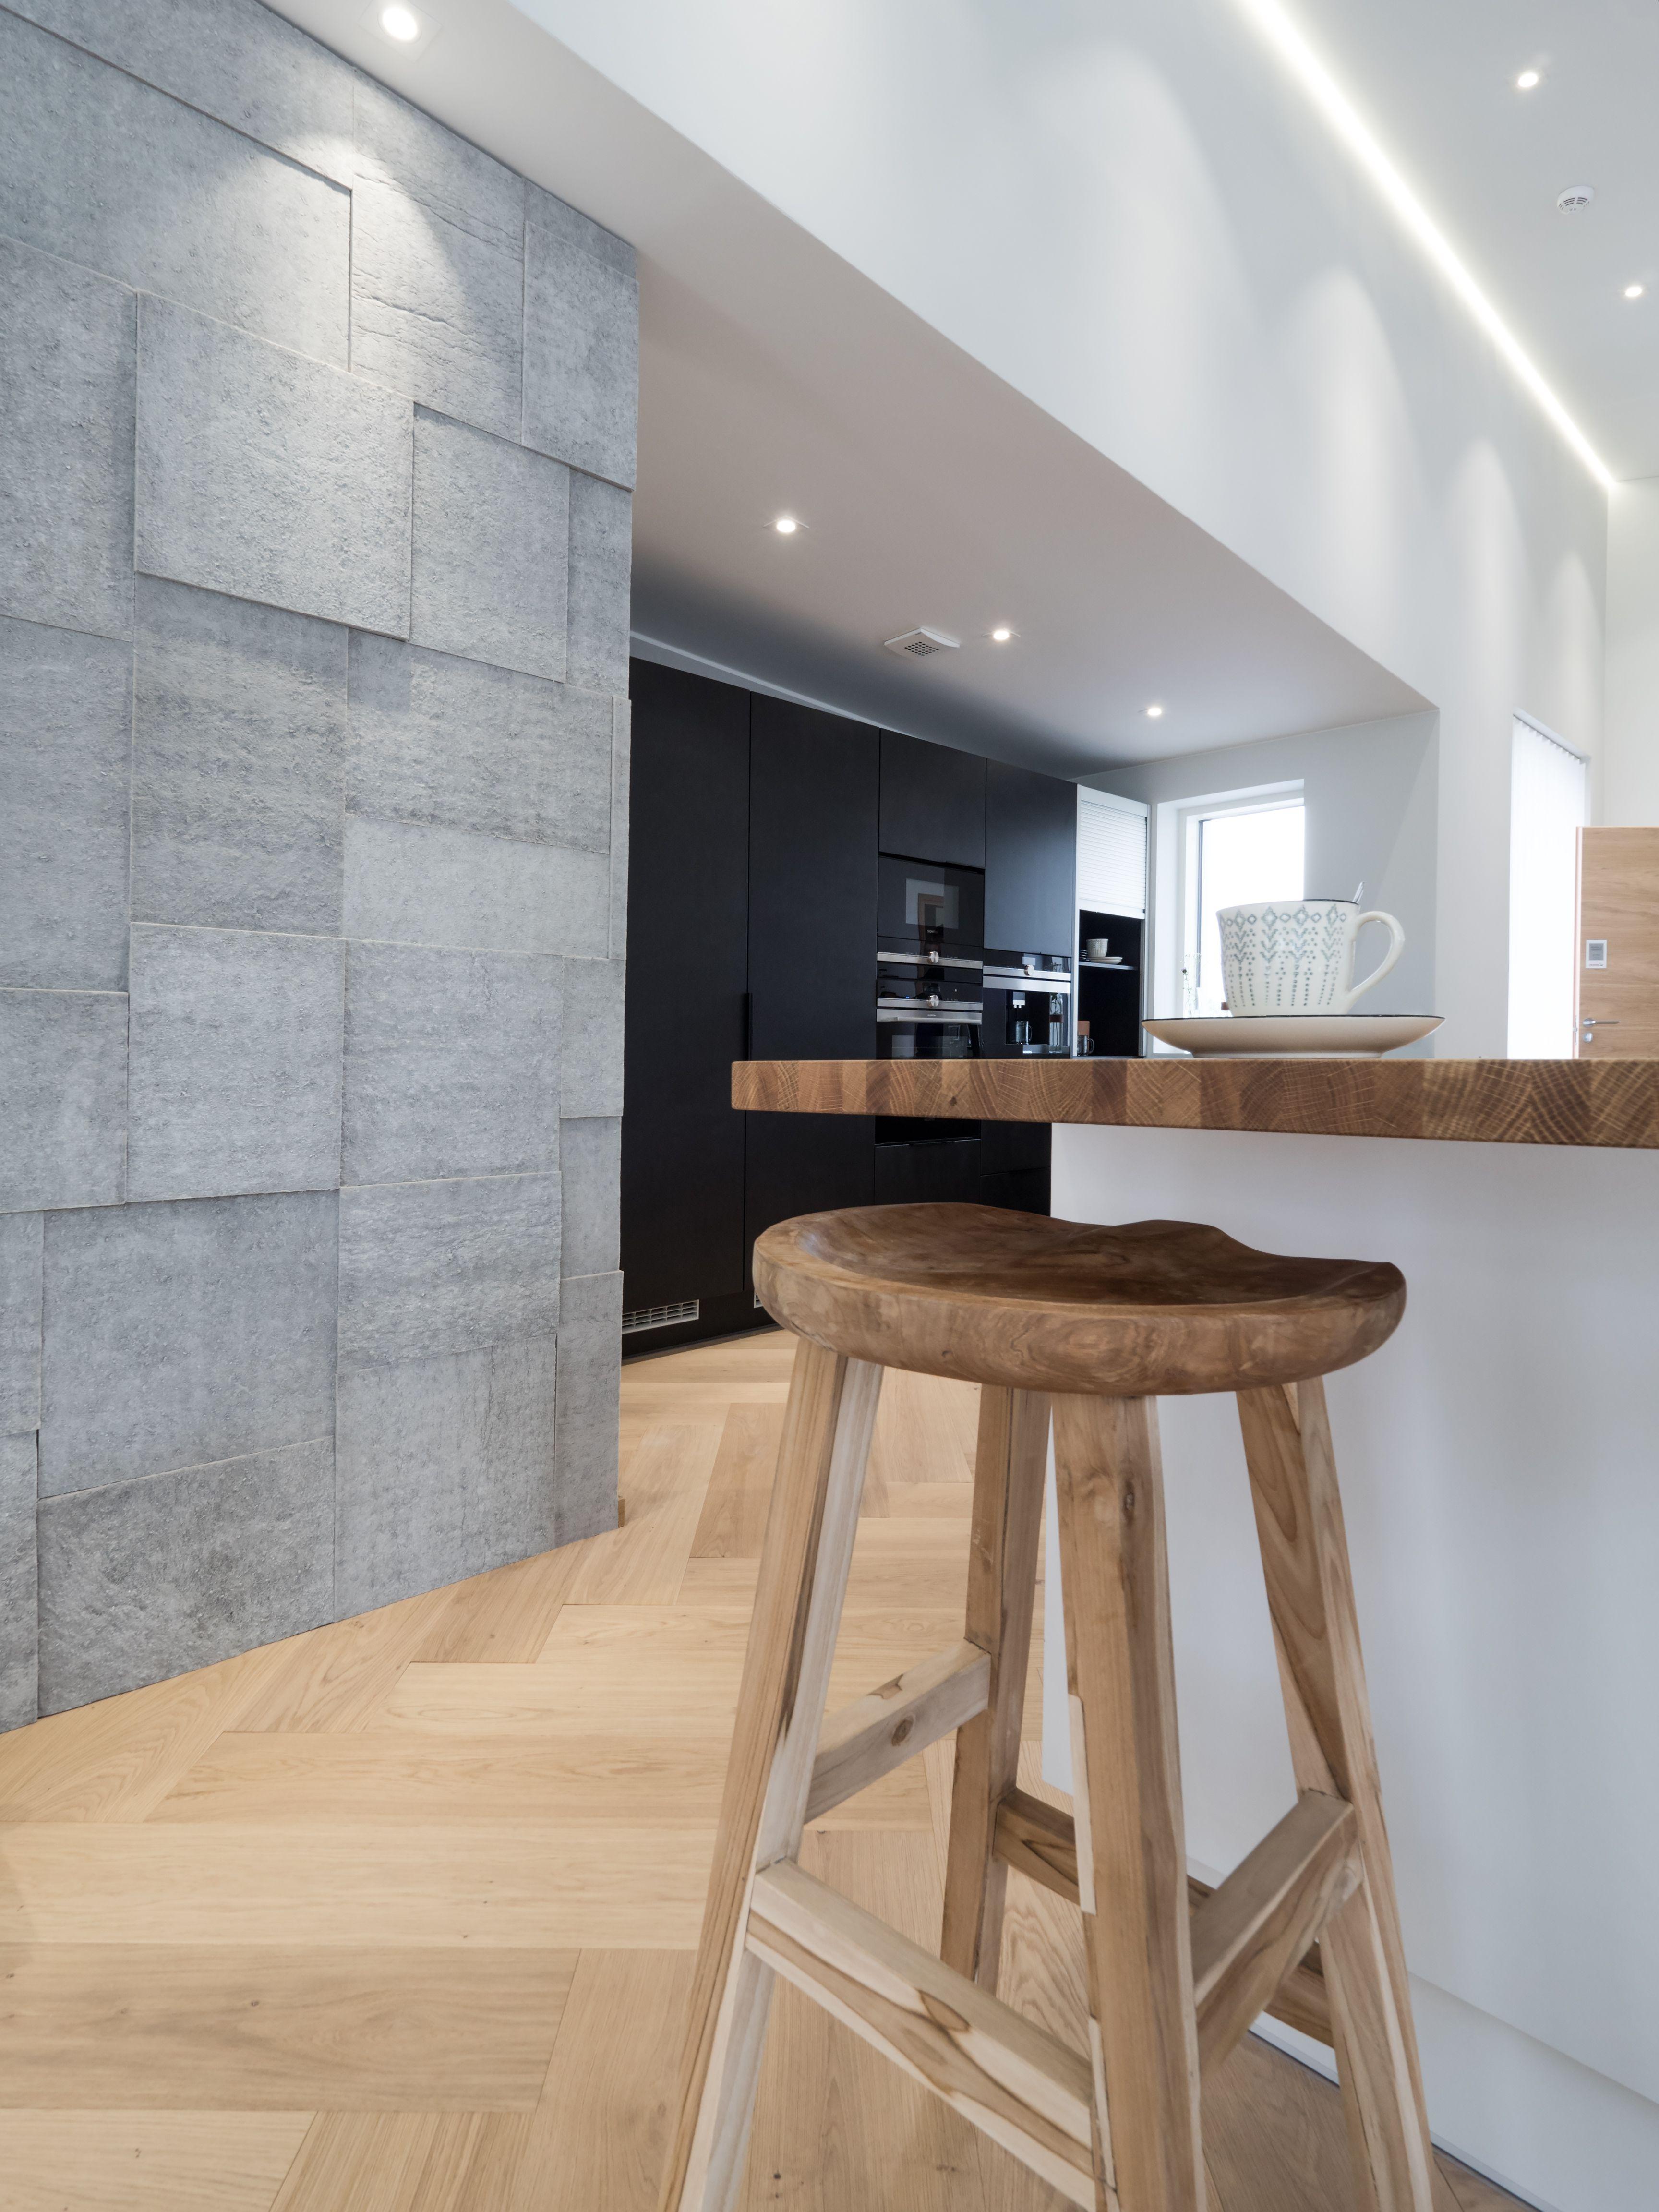 Would you like to drink your morning coffee in this modern kitchen under our Spectri LED-lights? Haluaisitko juoda aamukahvisi tässä modernissa keittiössä Spectri LED-valaisimien alla?